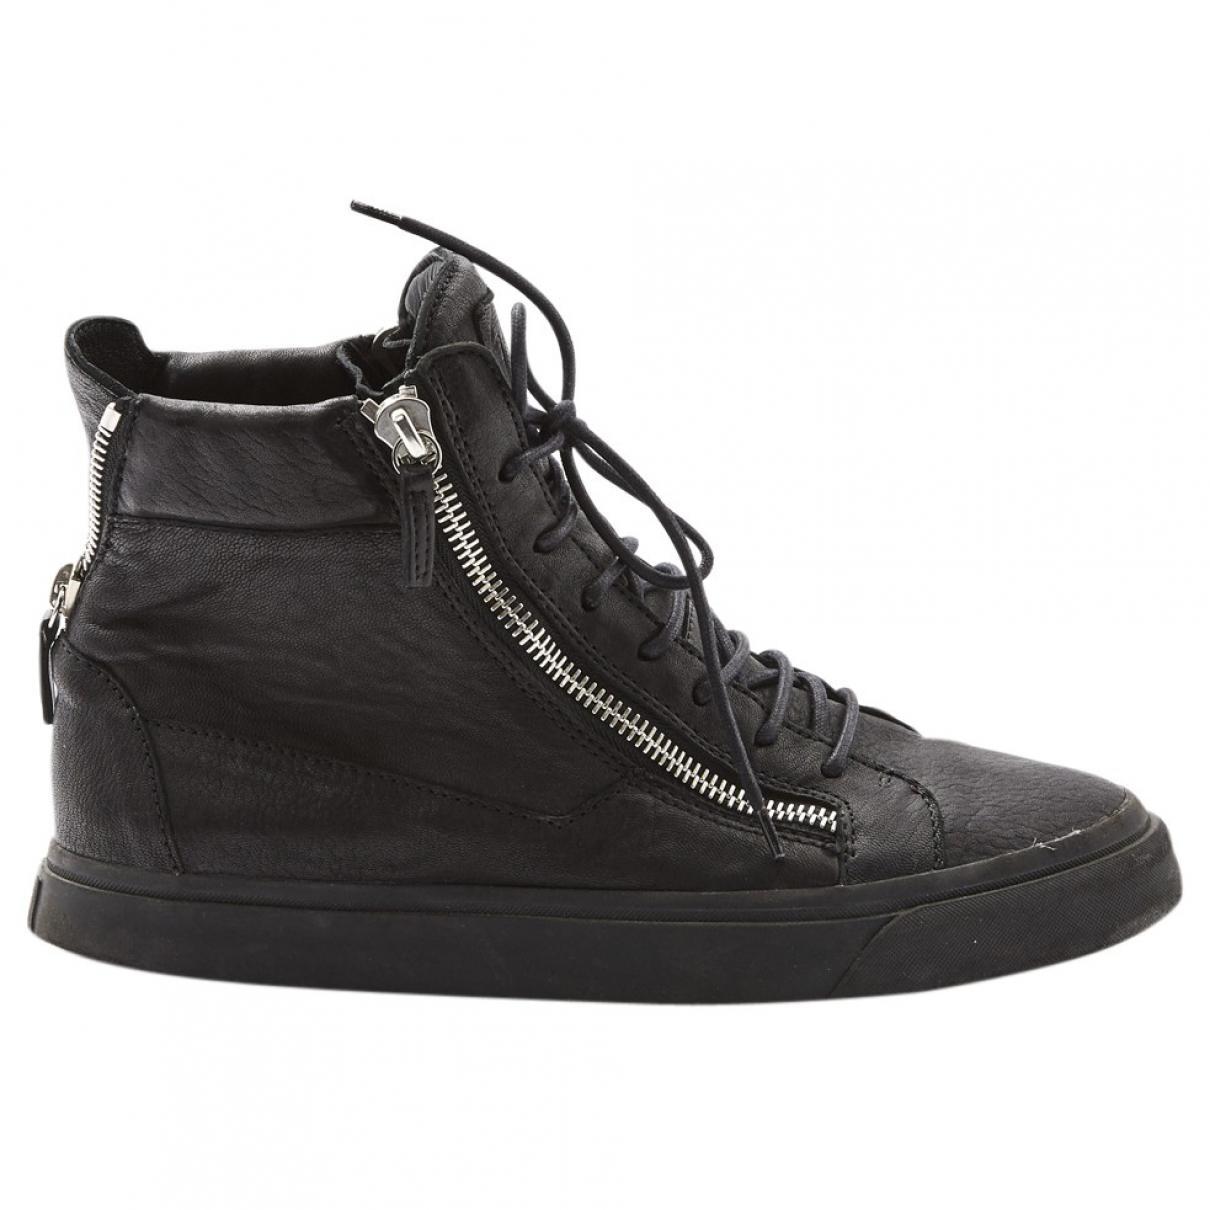 Pre-owned - Leather low trainers Giuseppe Zanotti YoHaFdAi7